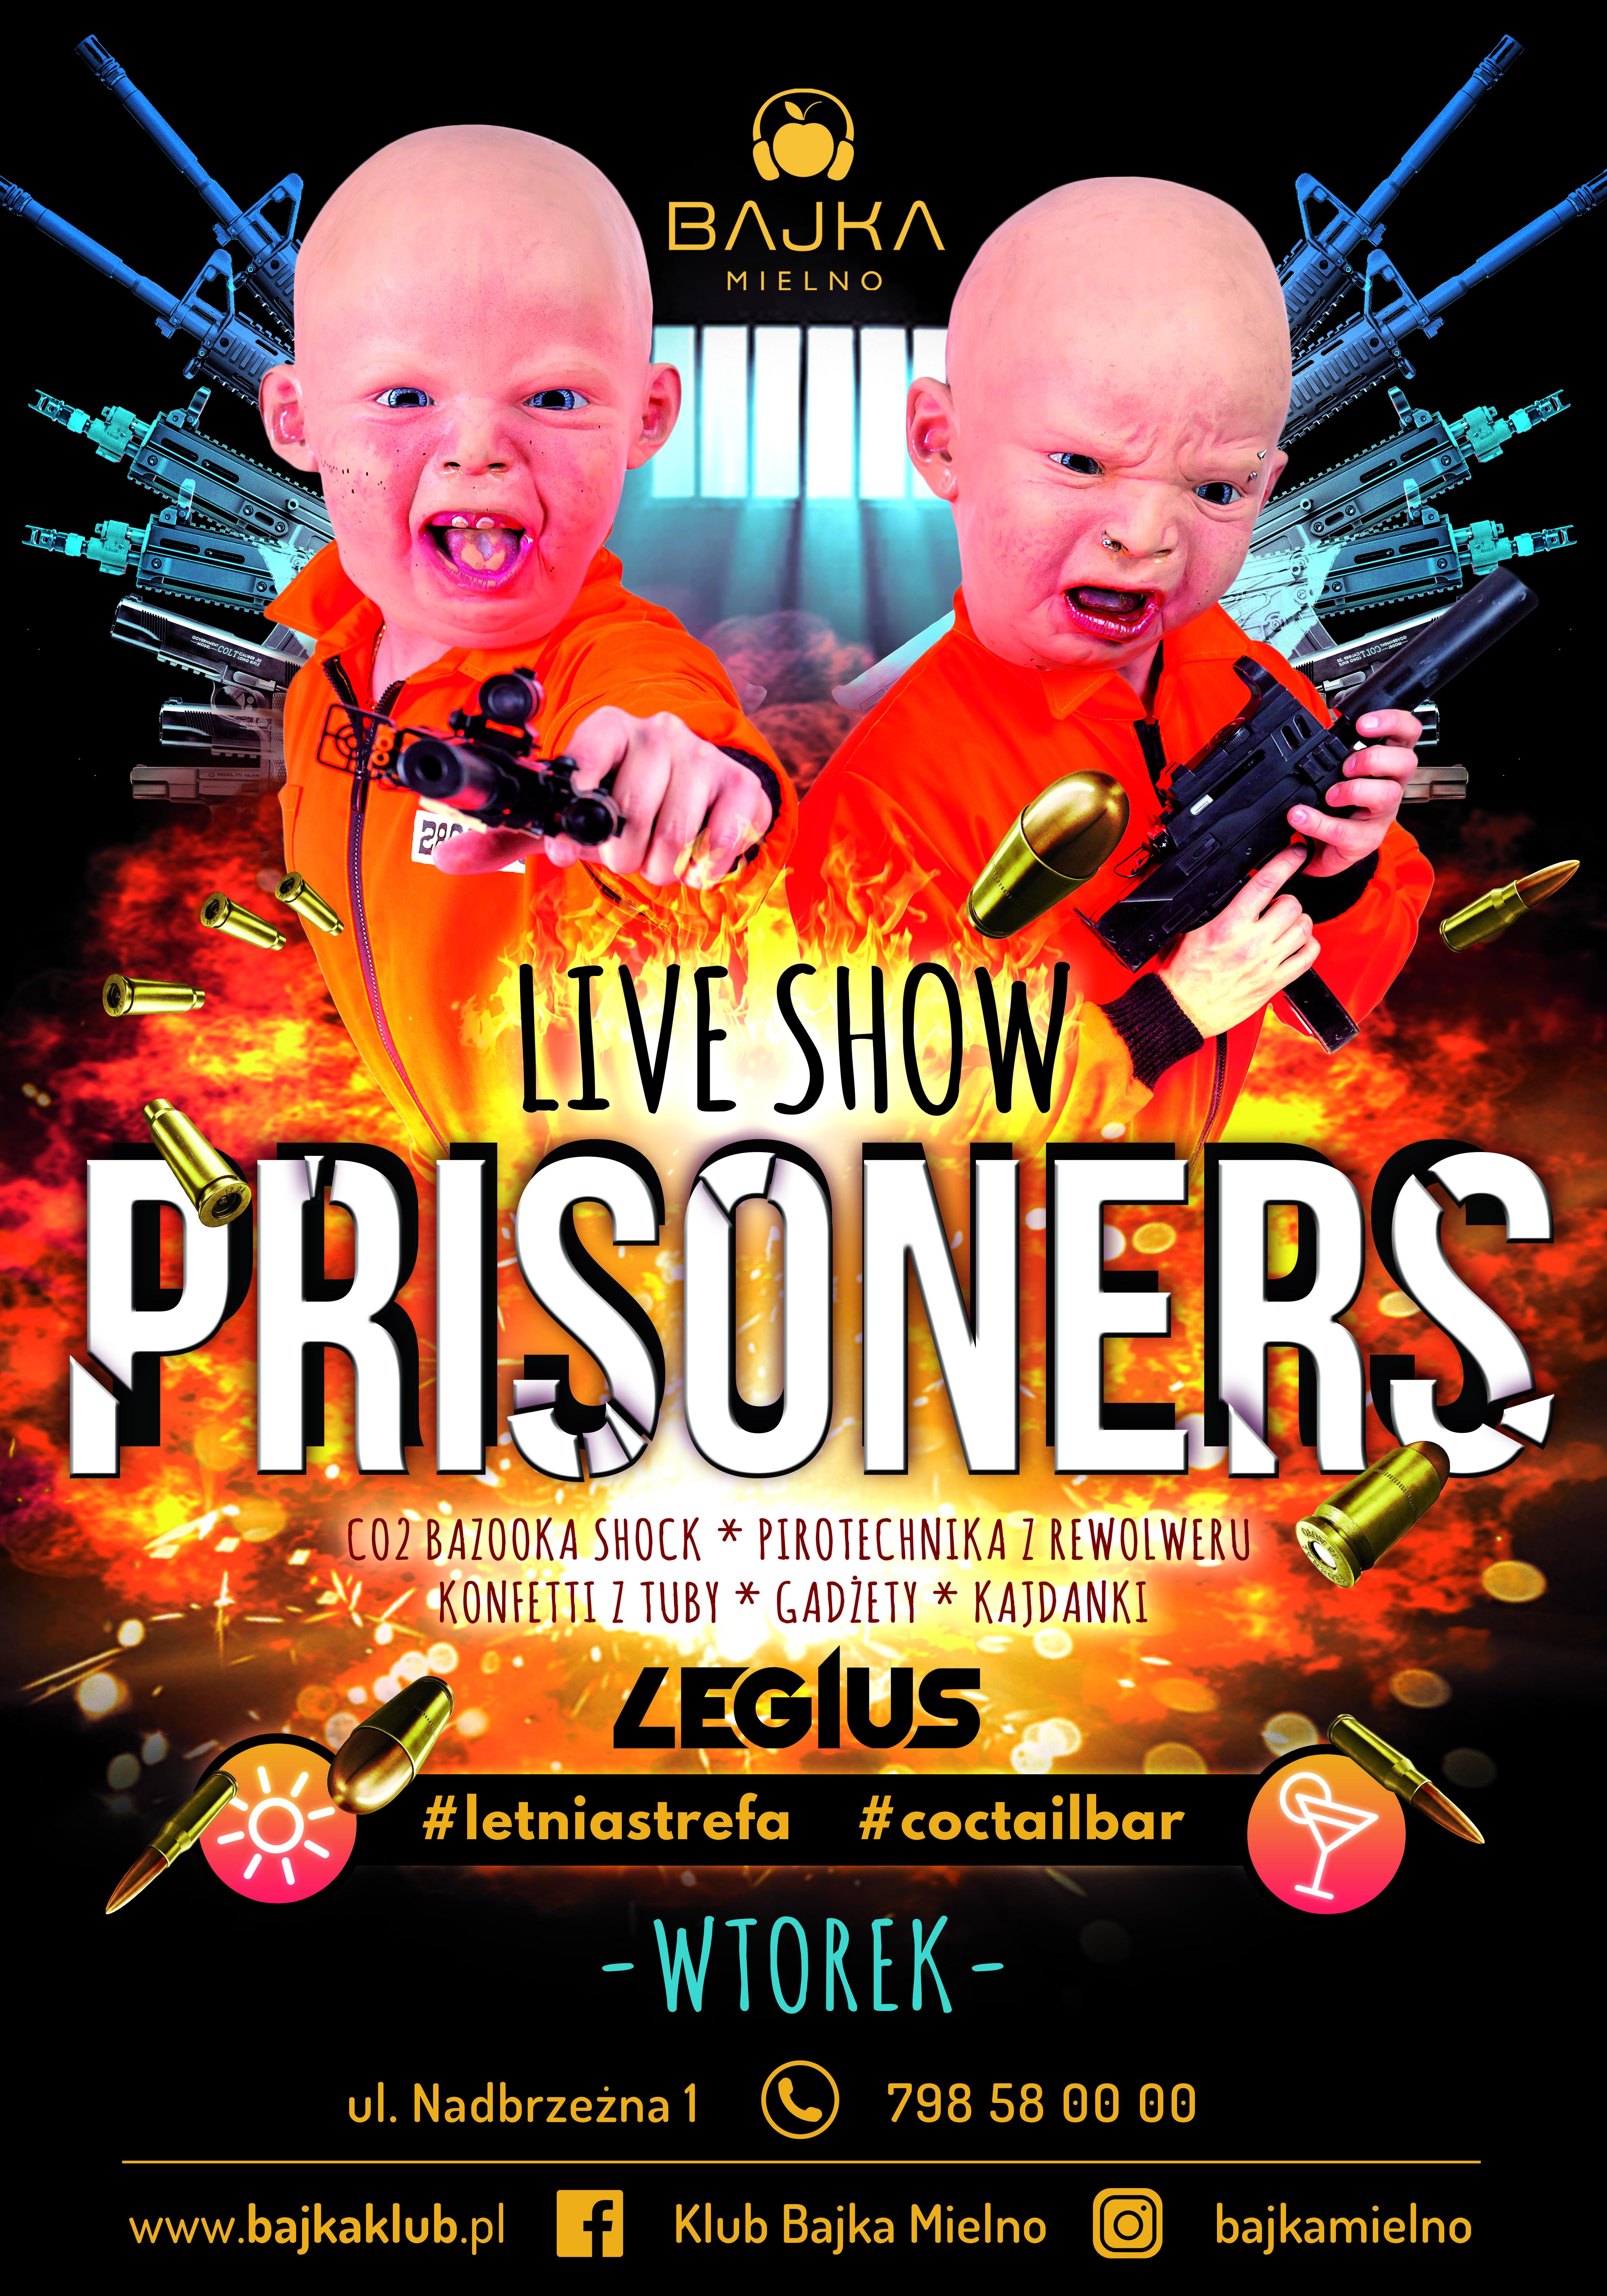 prisoners wt